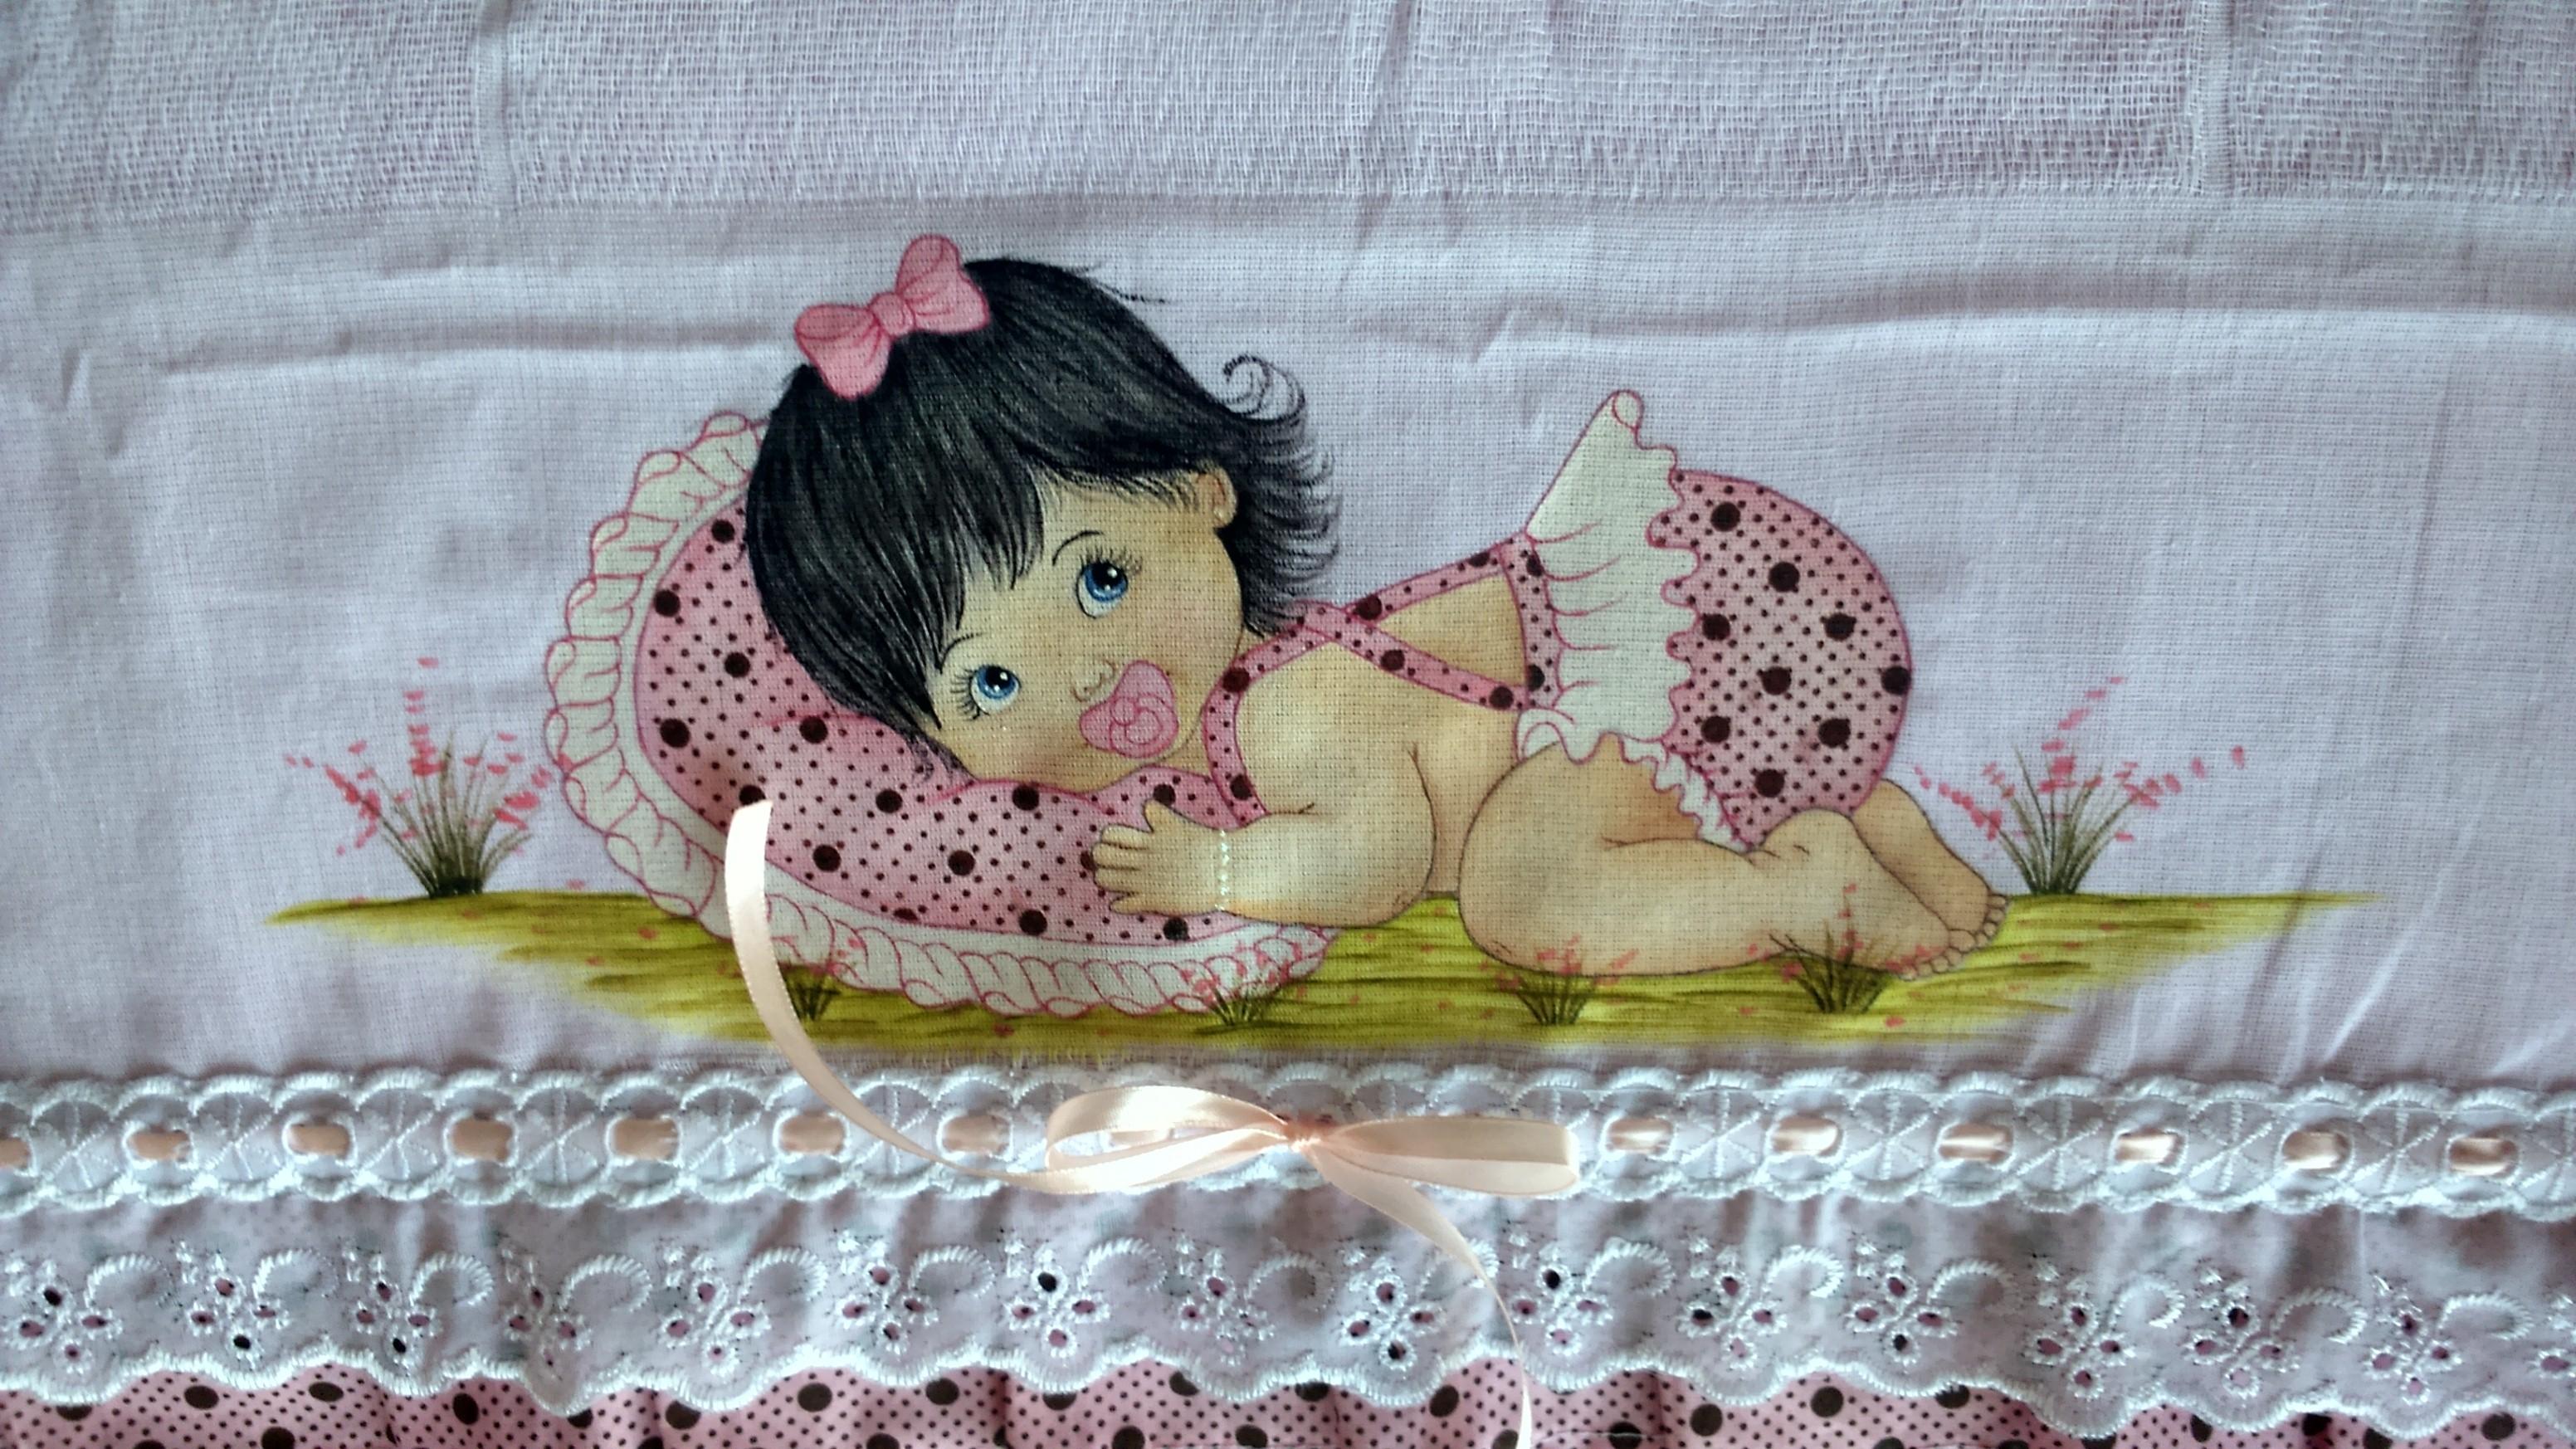 fralda-pintada-menina-pintura-em-tecido